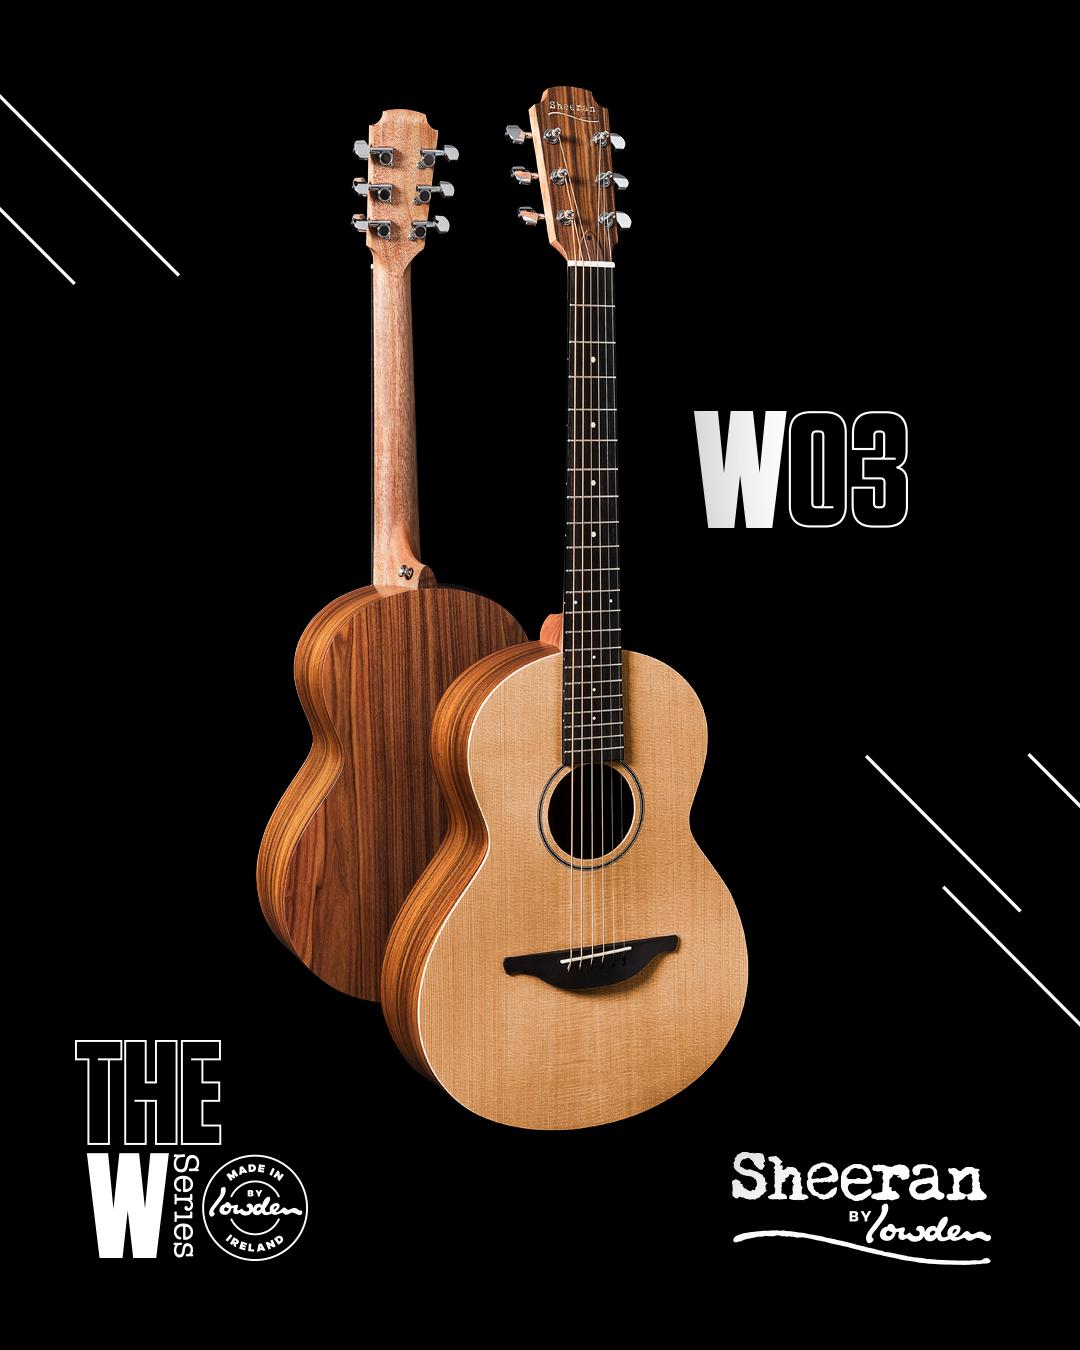 Sheeran W03 PRE ORDER